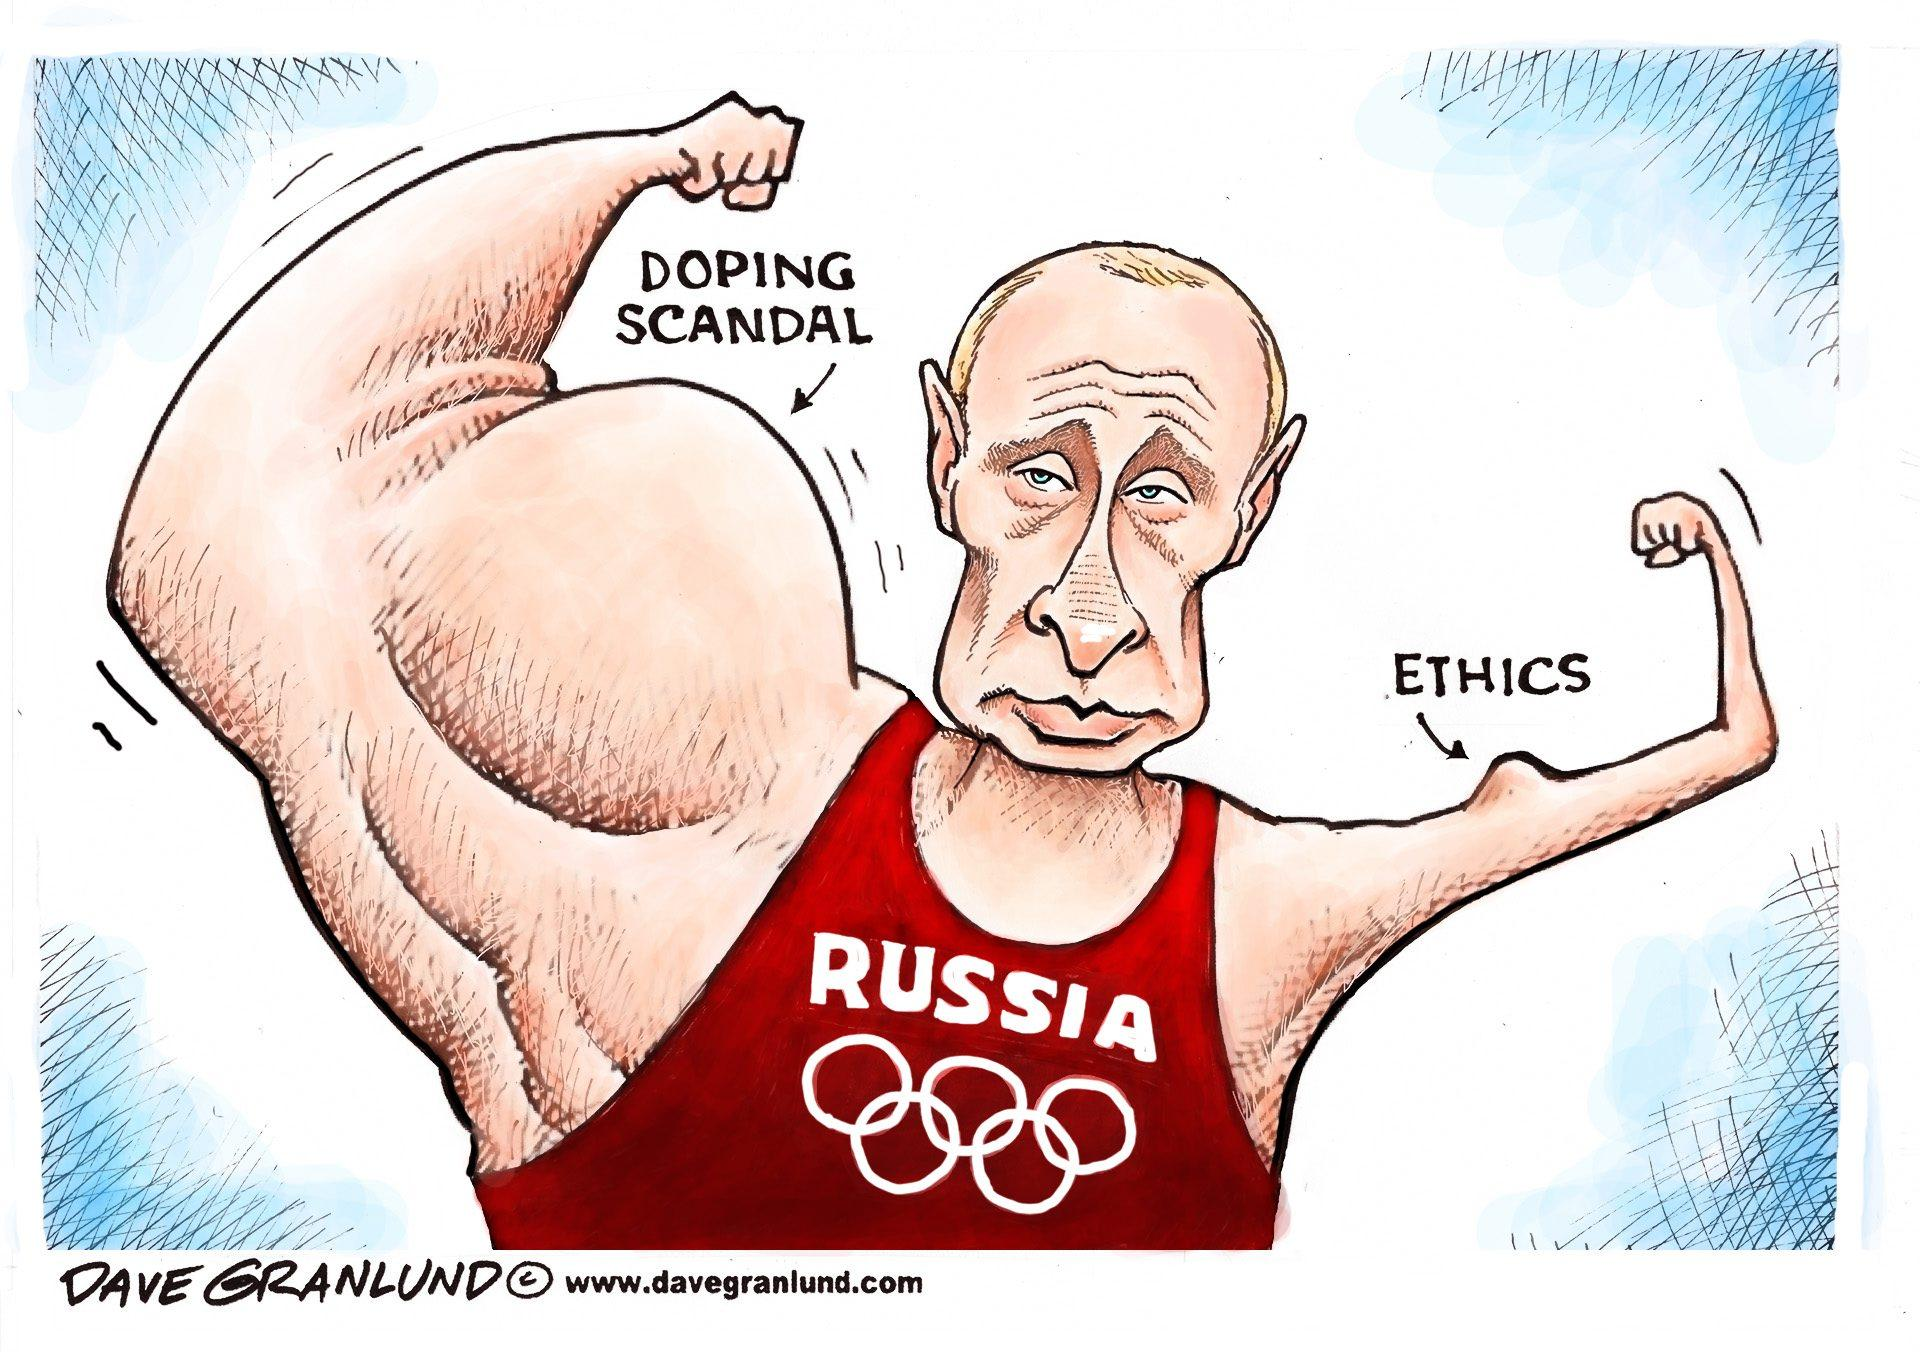 Moscow may preemptively boycott Rio Olympiad, Inozemtsev says -- EUROMAIDAN PRESSEuromaidan Press   News and views from Ukraine